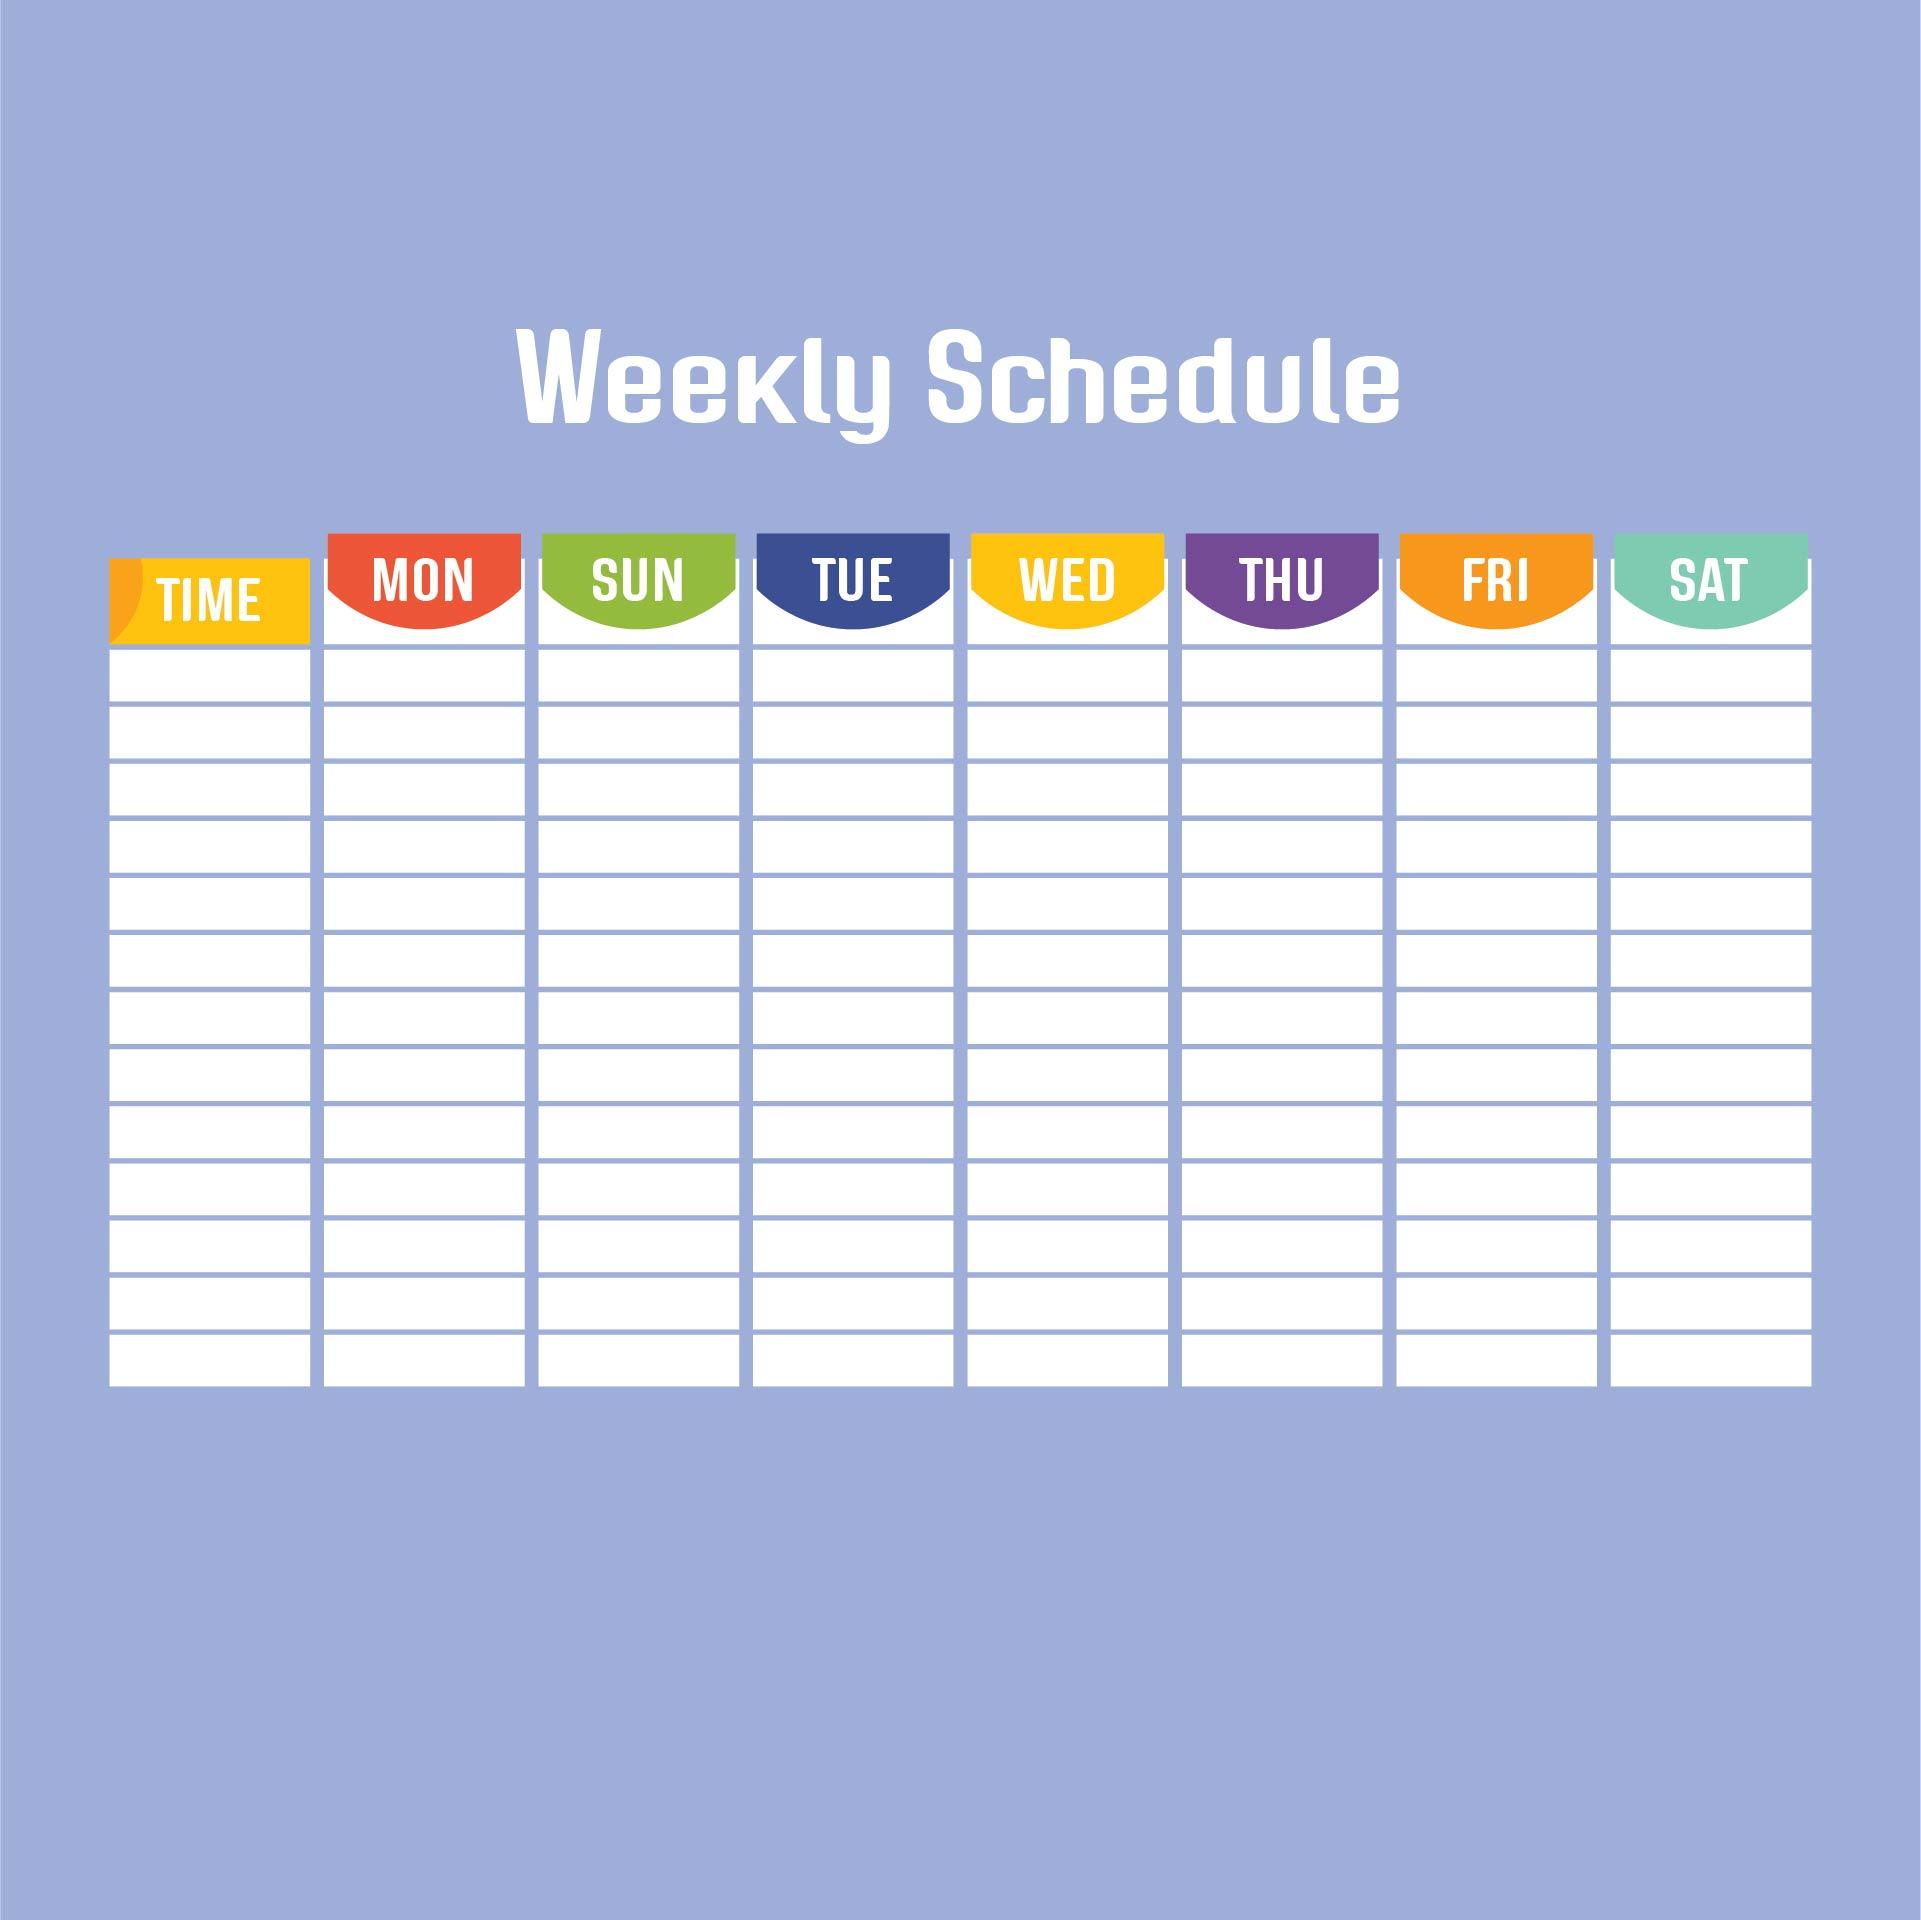 Weekly Work Schedule Template